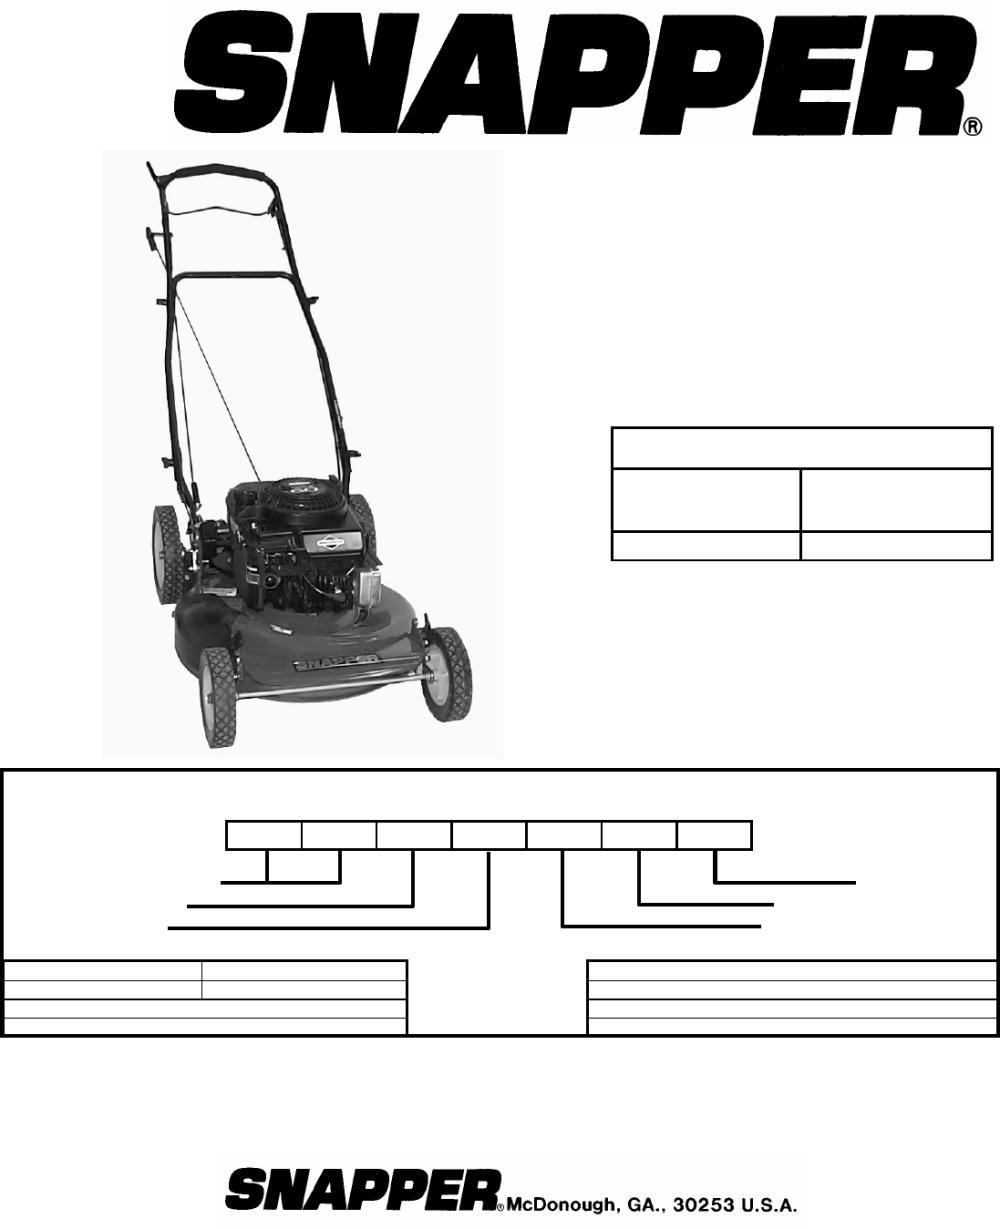 medium resolution of snapper lawn mower belt diagram des photos des photos de fond fond d snapper lawn mower belt diagram des photos des photos de fond fond d